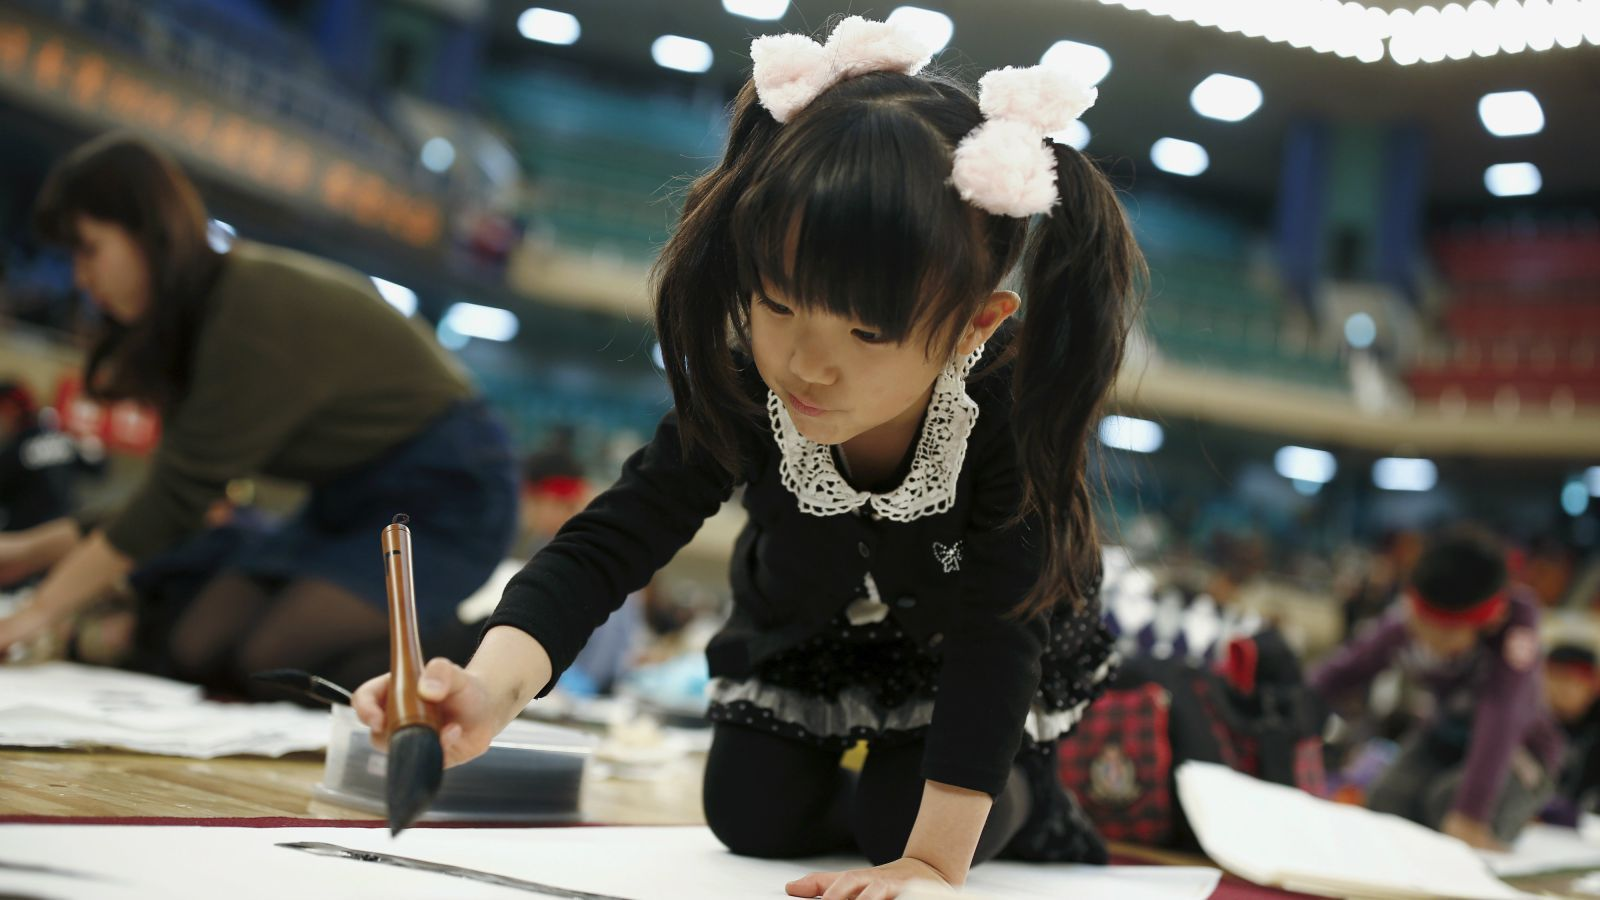 Kids understand writing much earlier than parents teach them, new